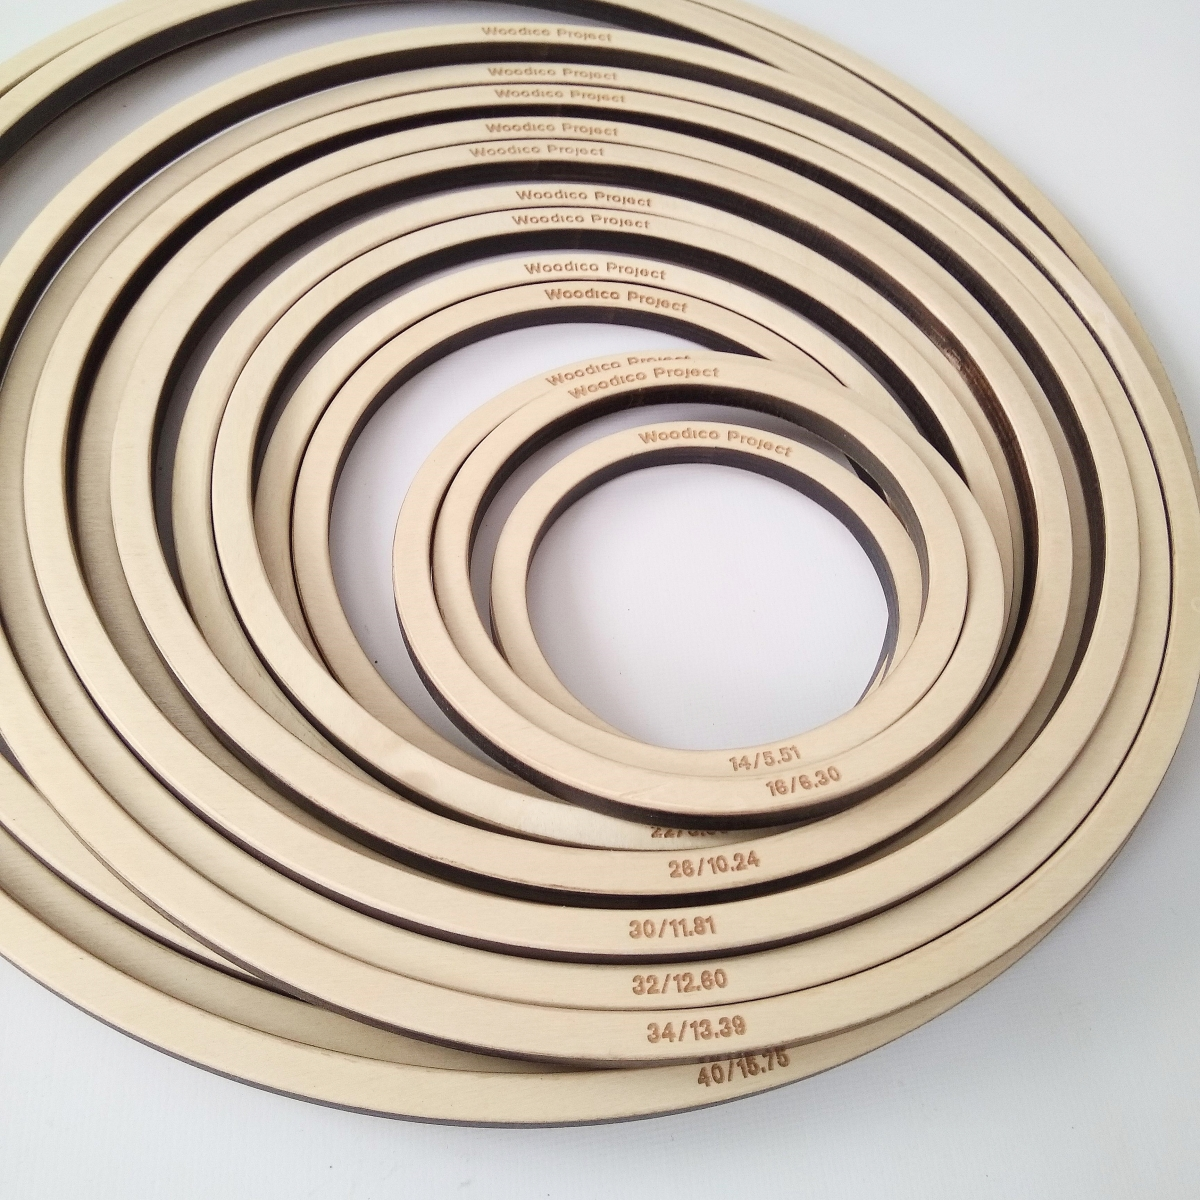 woodico.pro dream catcher base set of 15 rings 12 40 cm 11 1200x1200 - Dream catcher base / Set of 15 rings 12-40 cm